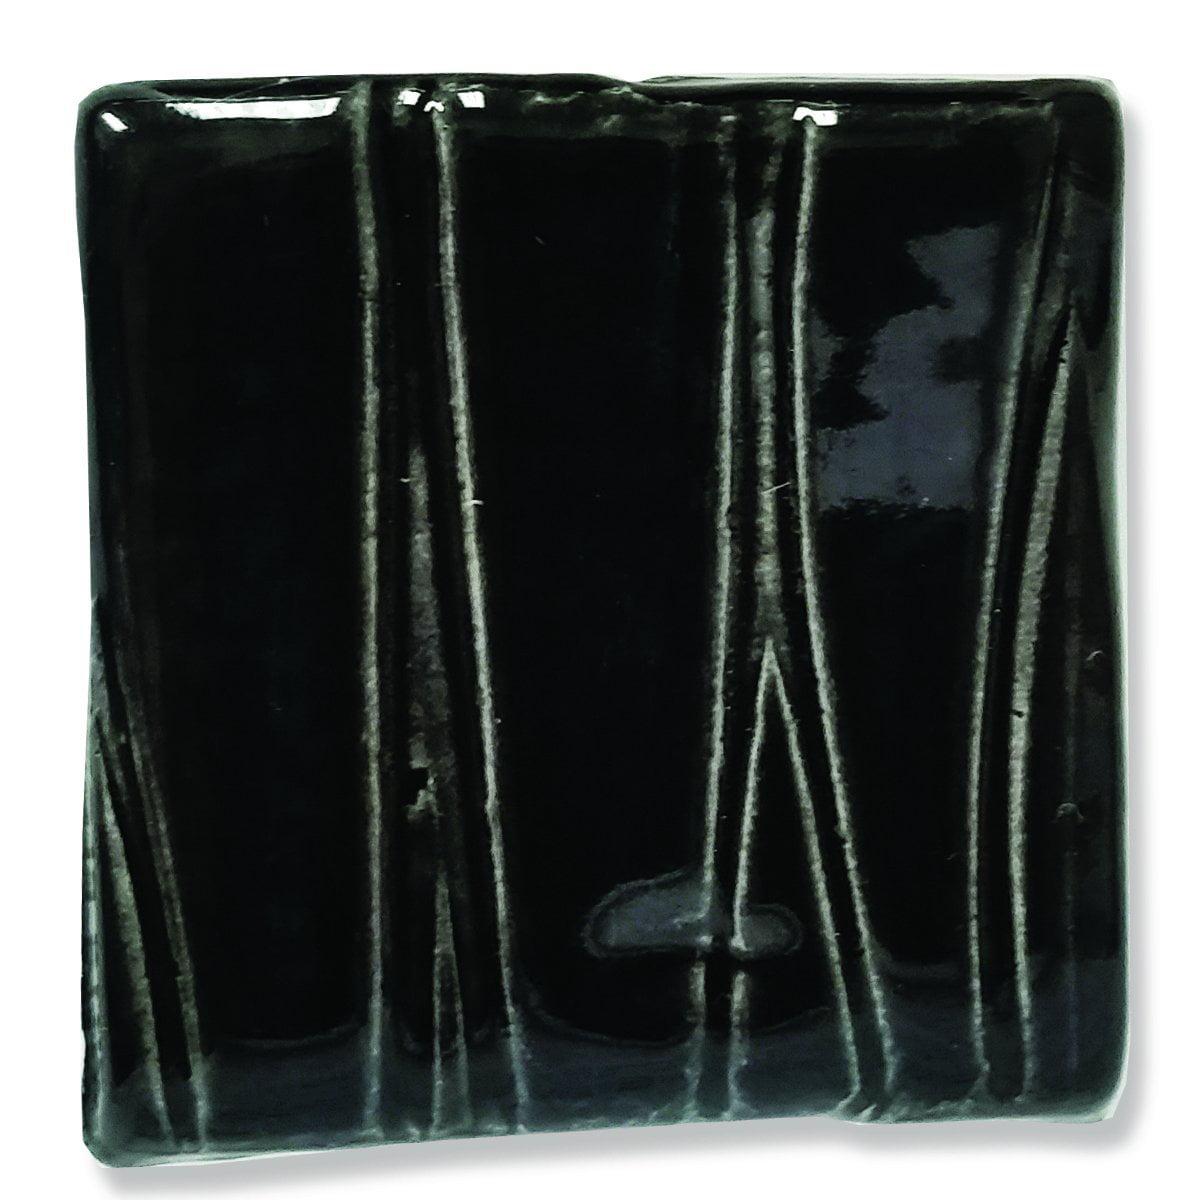 Speedball Art 16 oz. (pint) Earthenware Glaze--Black